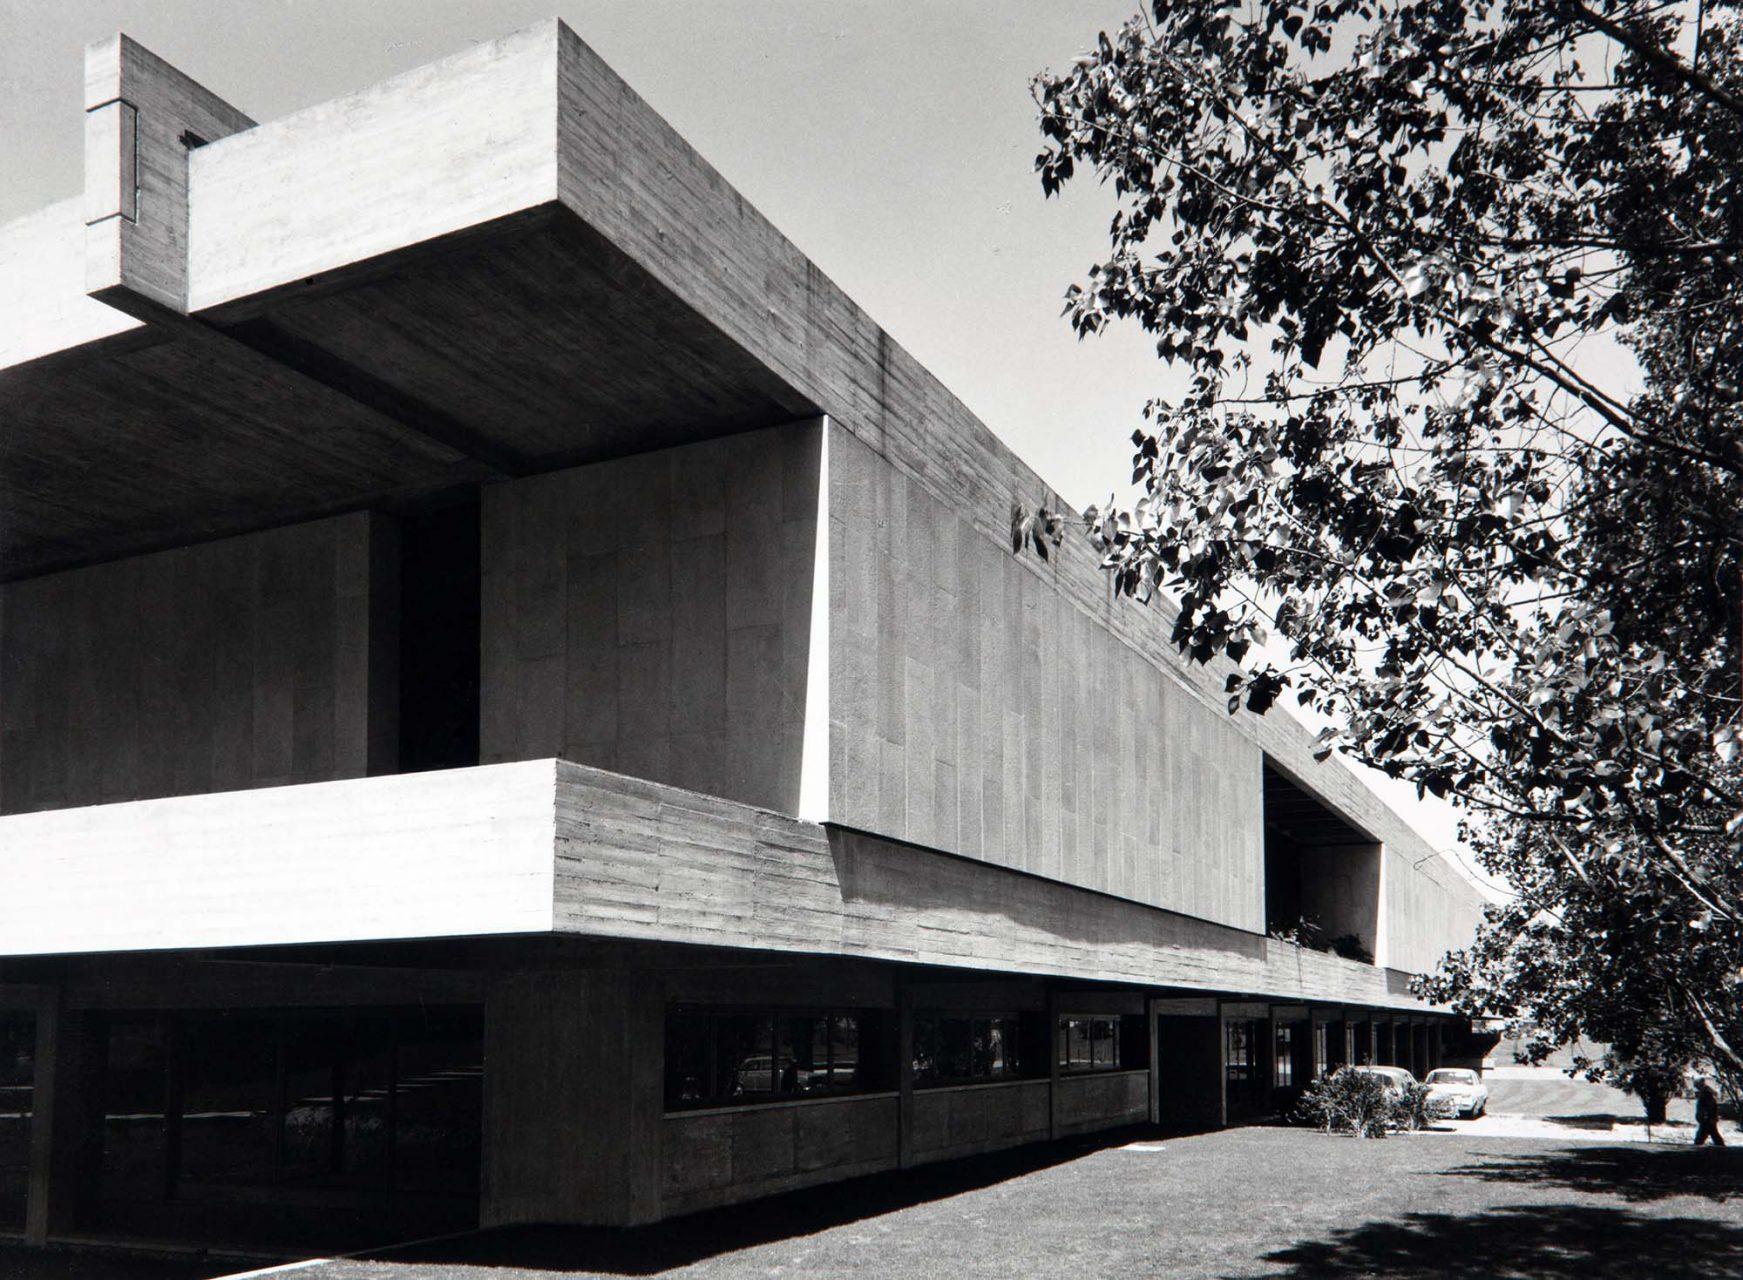 Gulbenkian Museum. Gartenansicht, späte 1970er